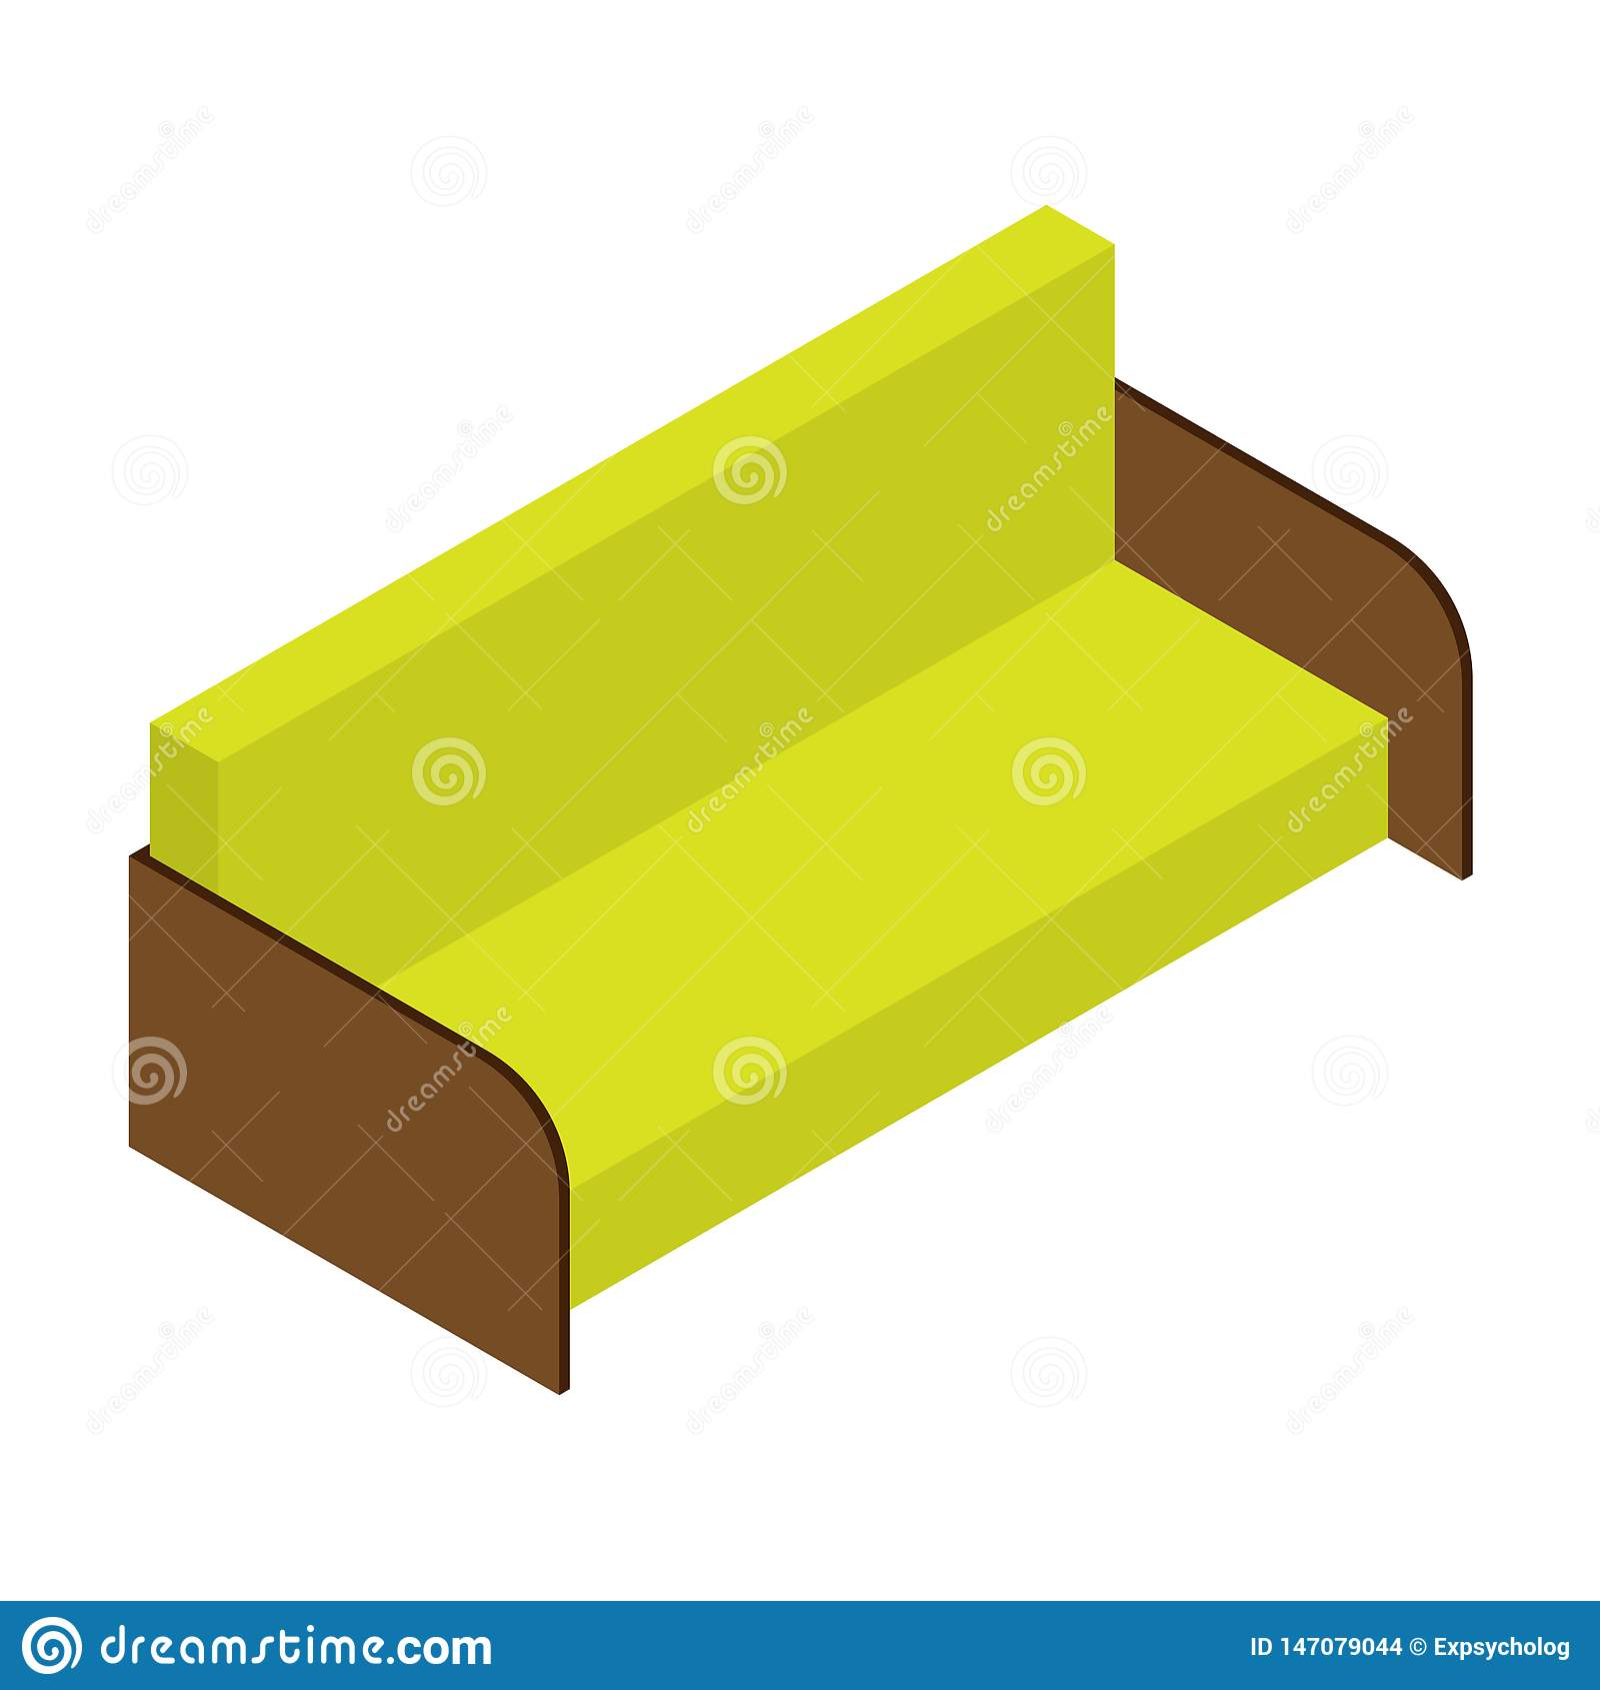 Sofa of lemon color. Isometric vector illustration, web, decor, print, application on white background.